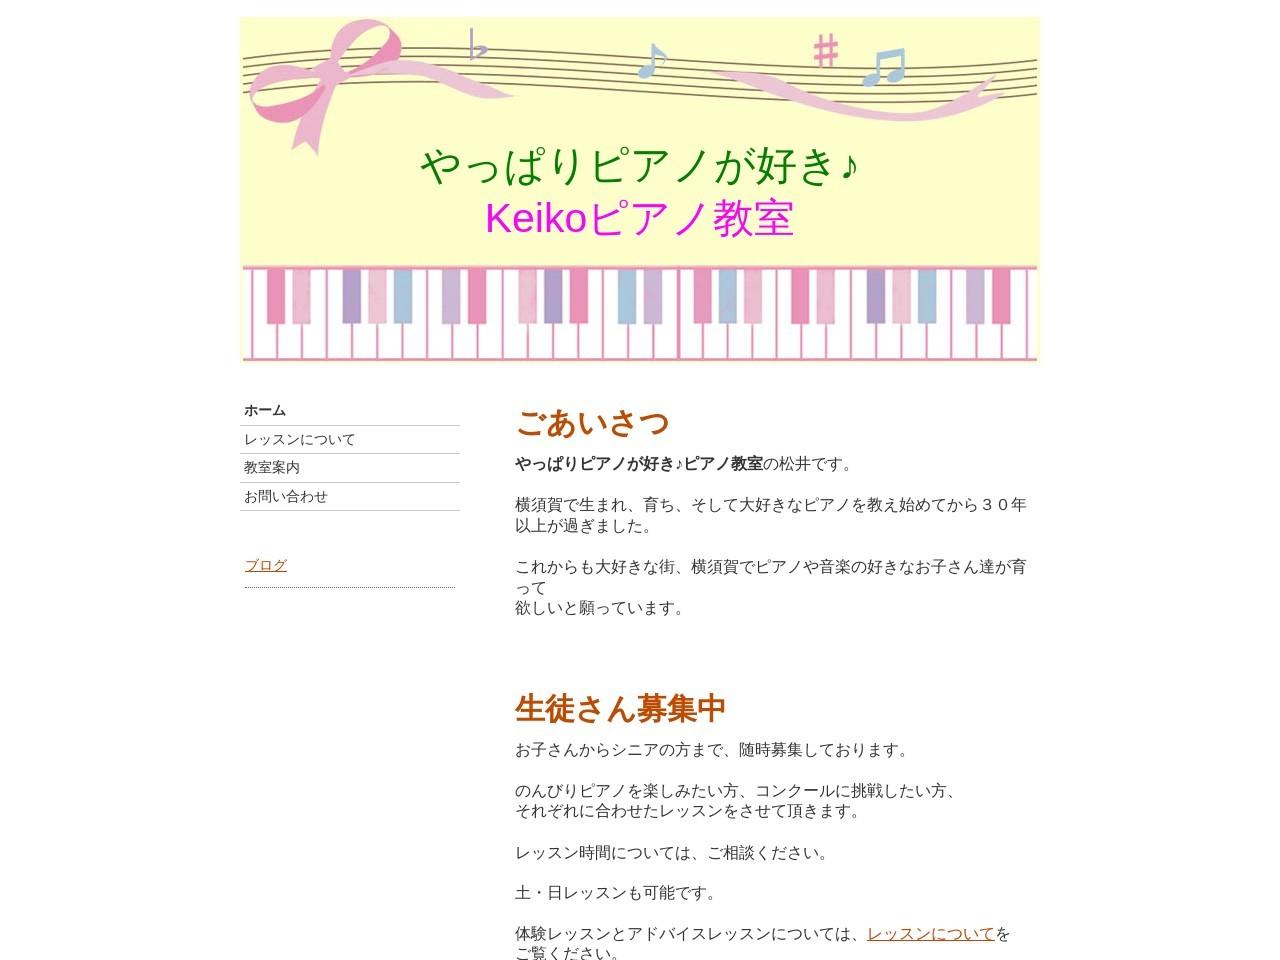 Keikoピアノ教室(汐入教室)のサムネイル